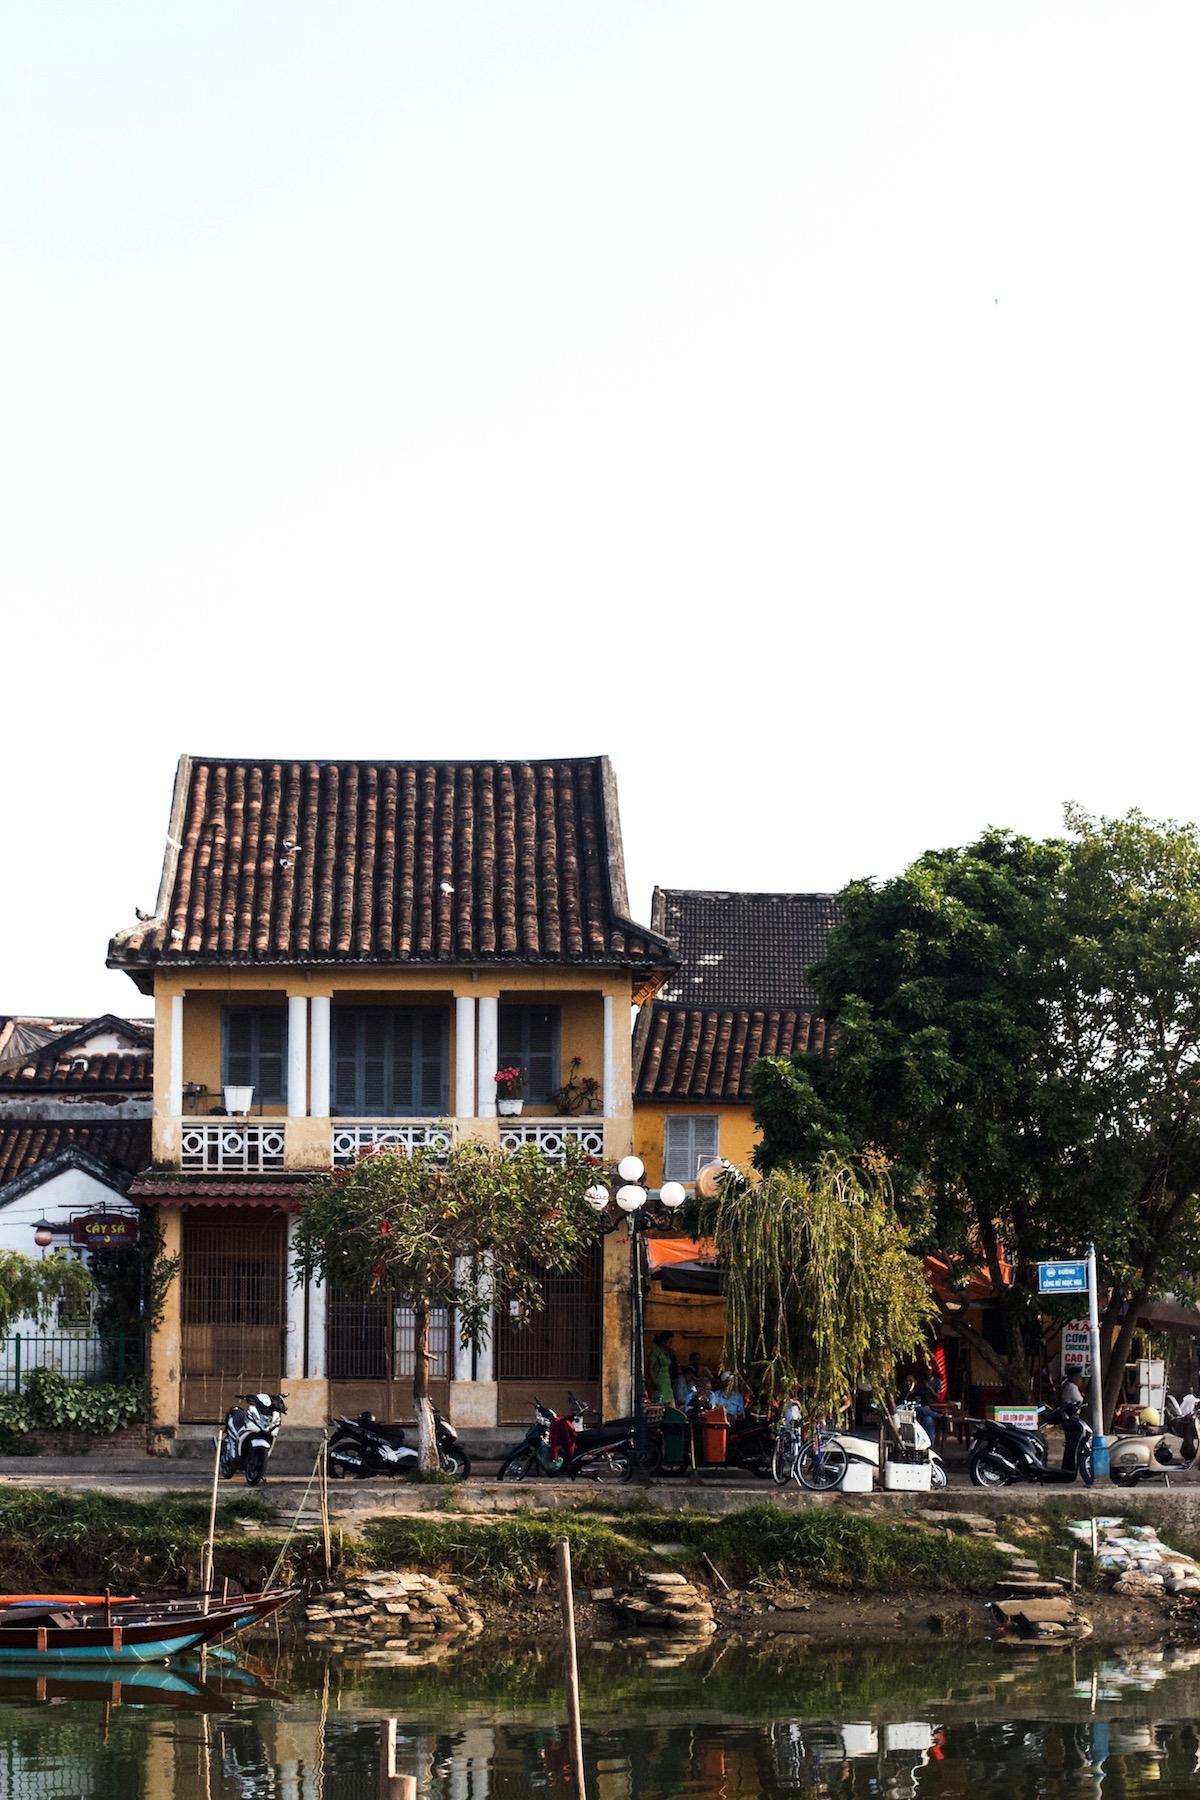 Vietnam - Da Nang, Hoi An, Mekong River Delta + Ho Chi Minh City